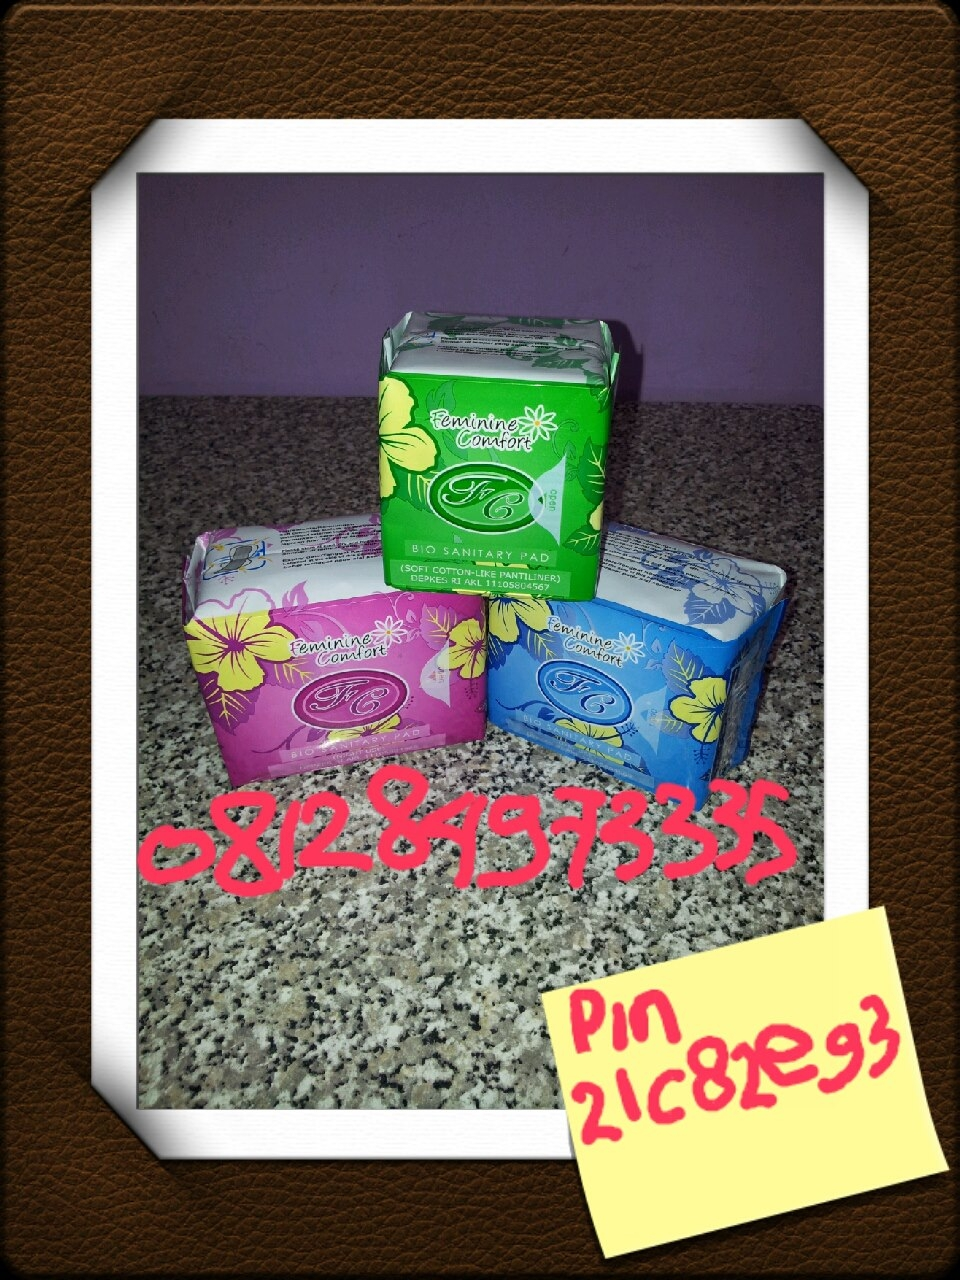 Distributor Avail Rani 081284973335 7ed95ace Jakarta Utaraserang Pembalut Selasa 20 November 2012